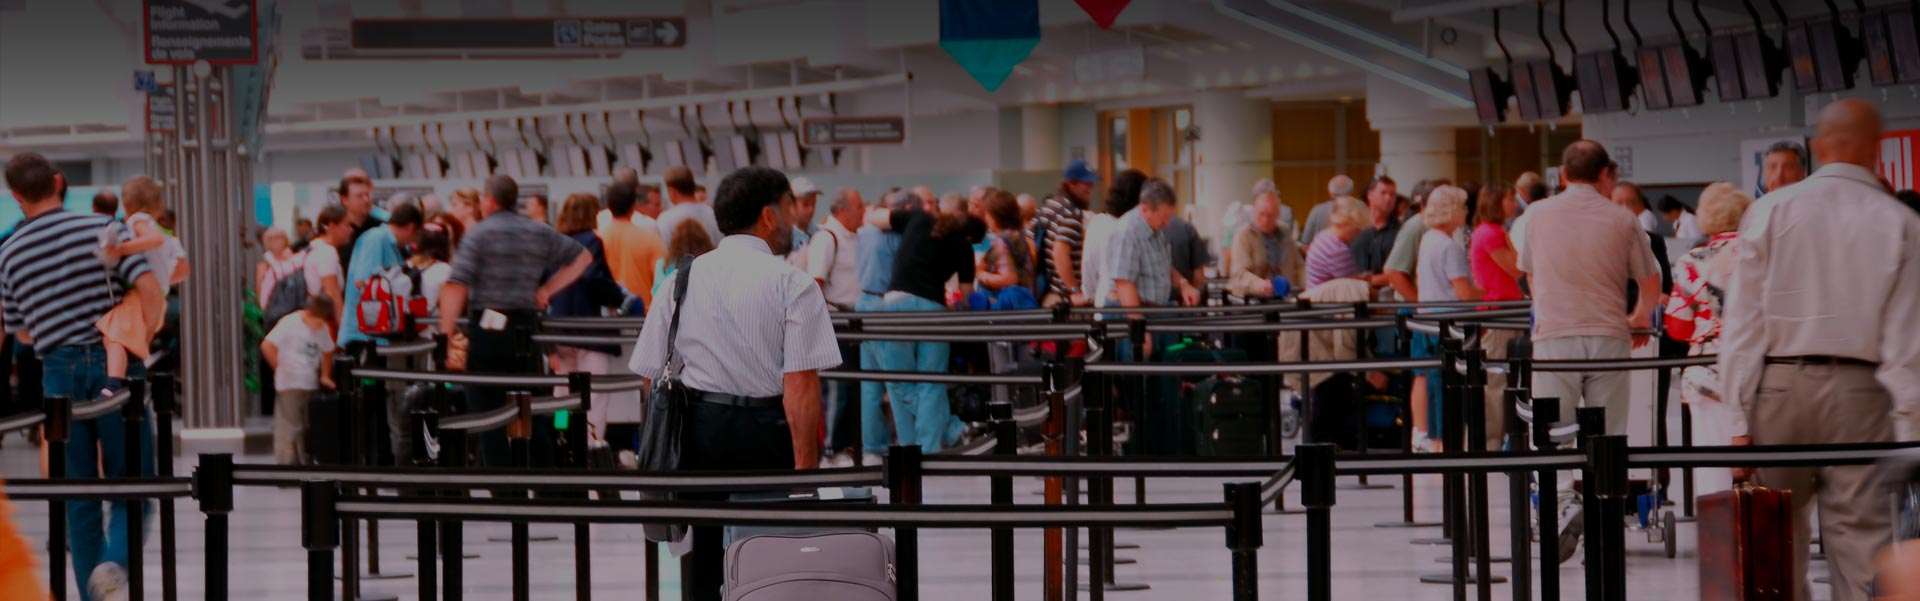 Passenger Flow Simulation at Frankfurt Airport – AnyLogic